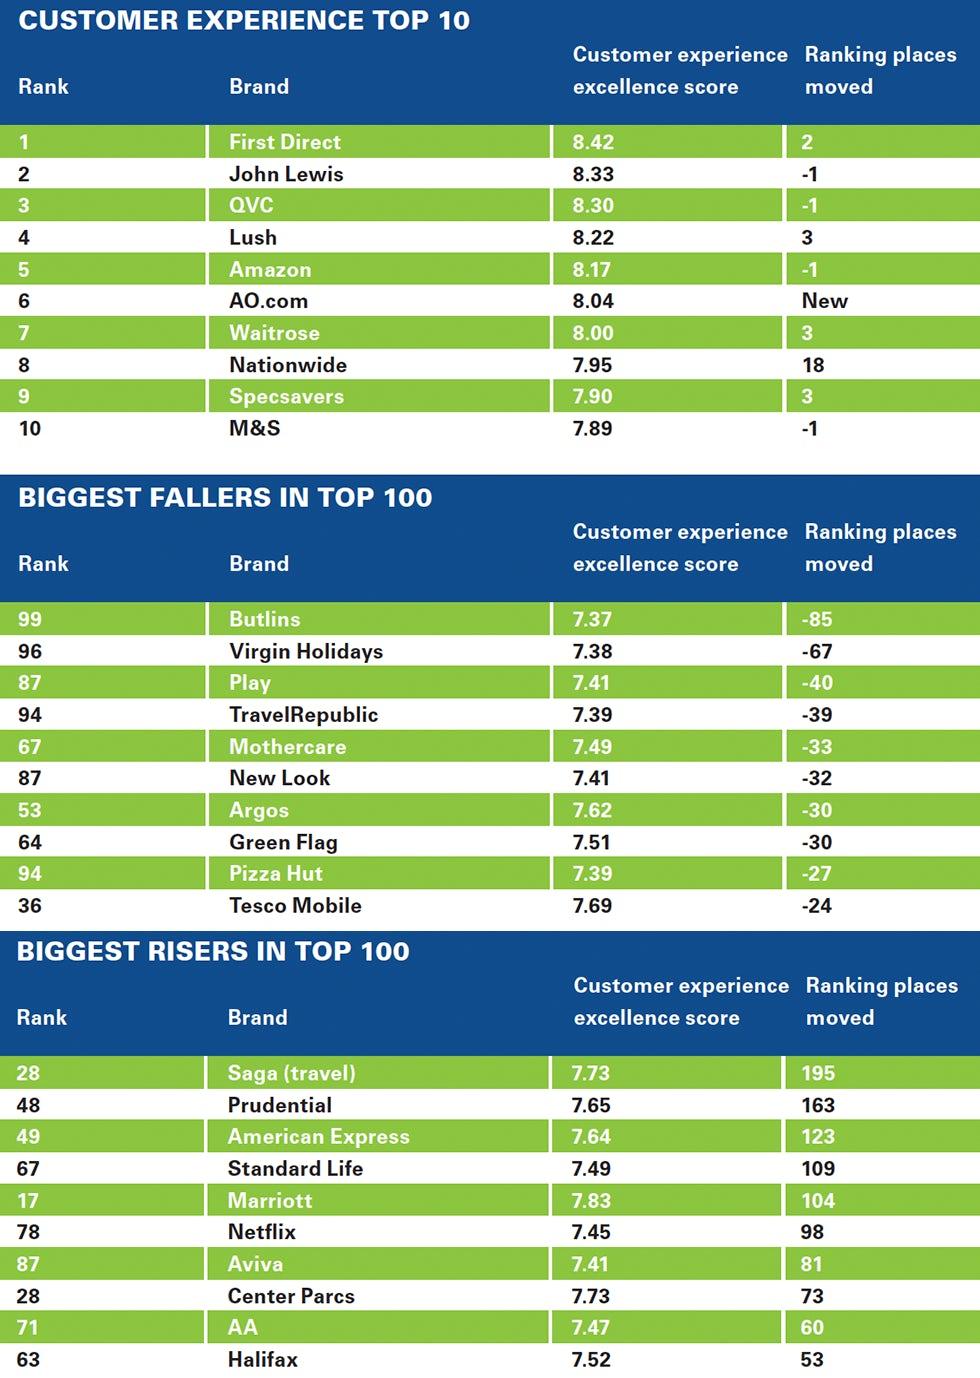 Nunwood Company top 10s